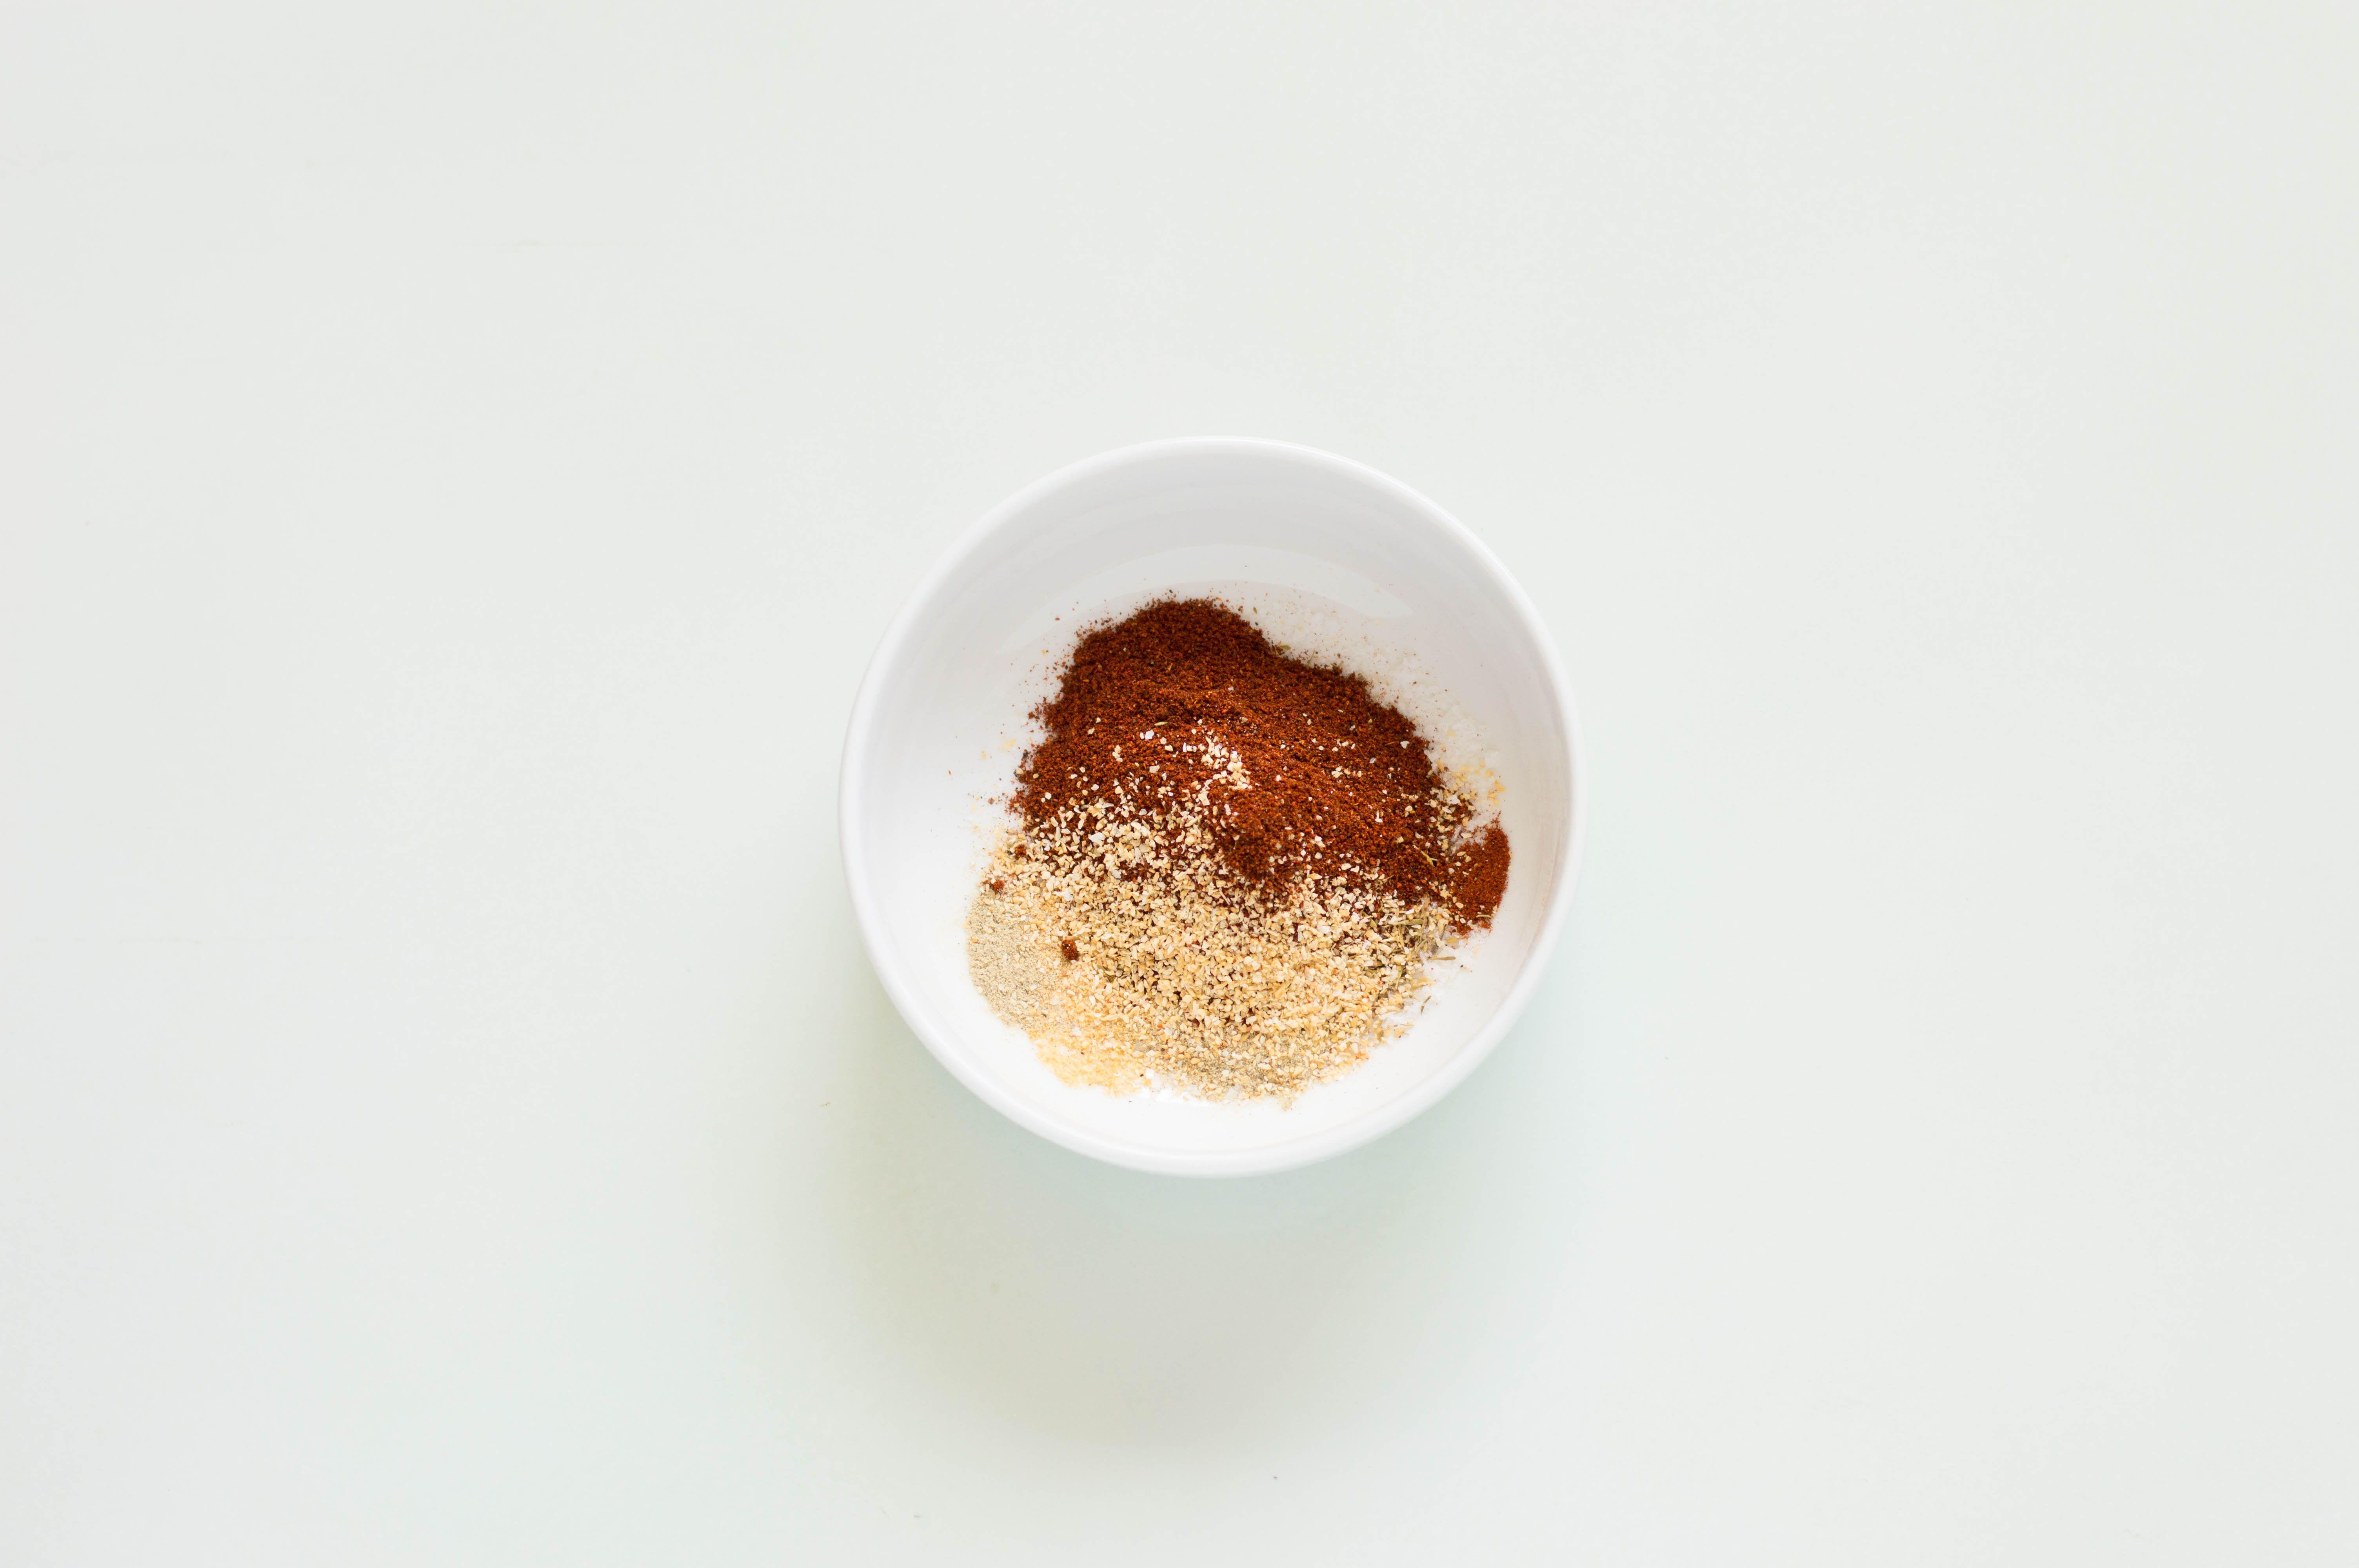 combine spices